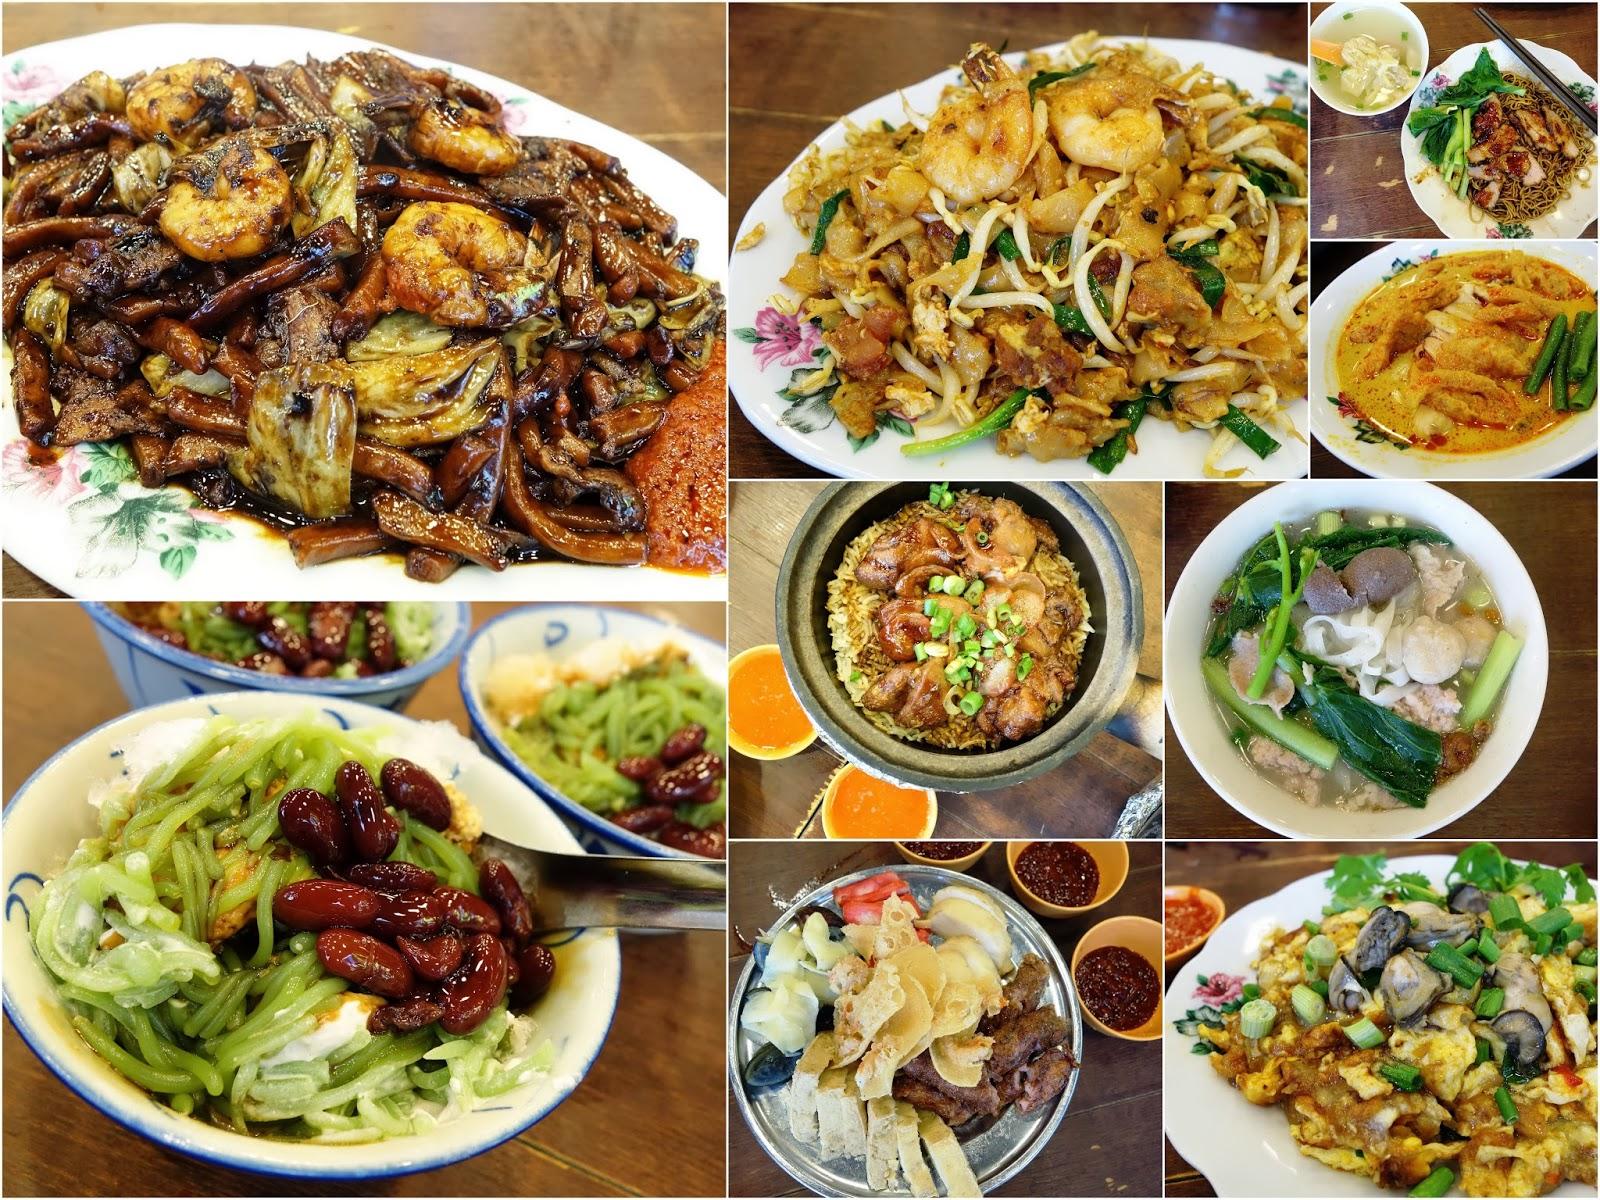 Malaysian Food Calories List